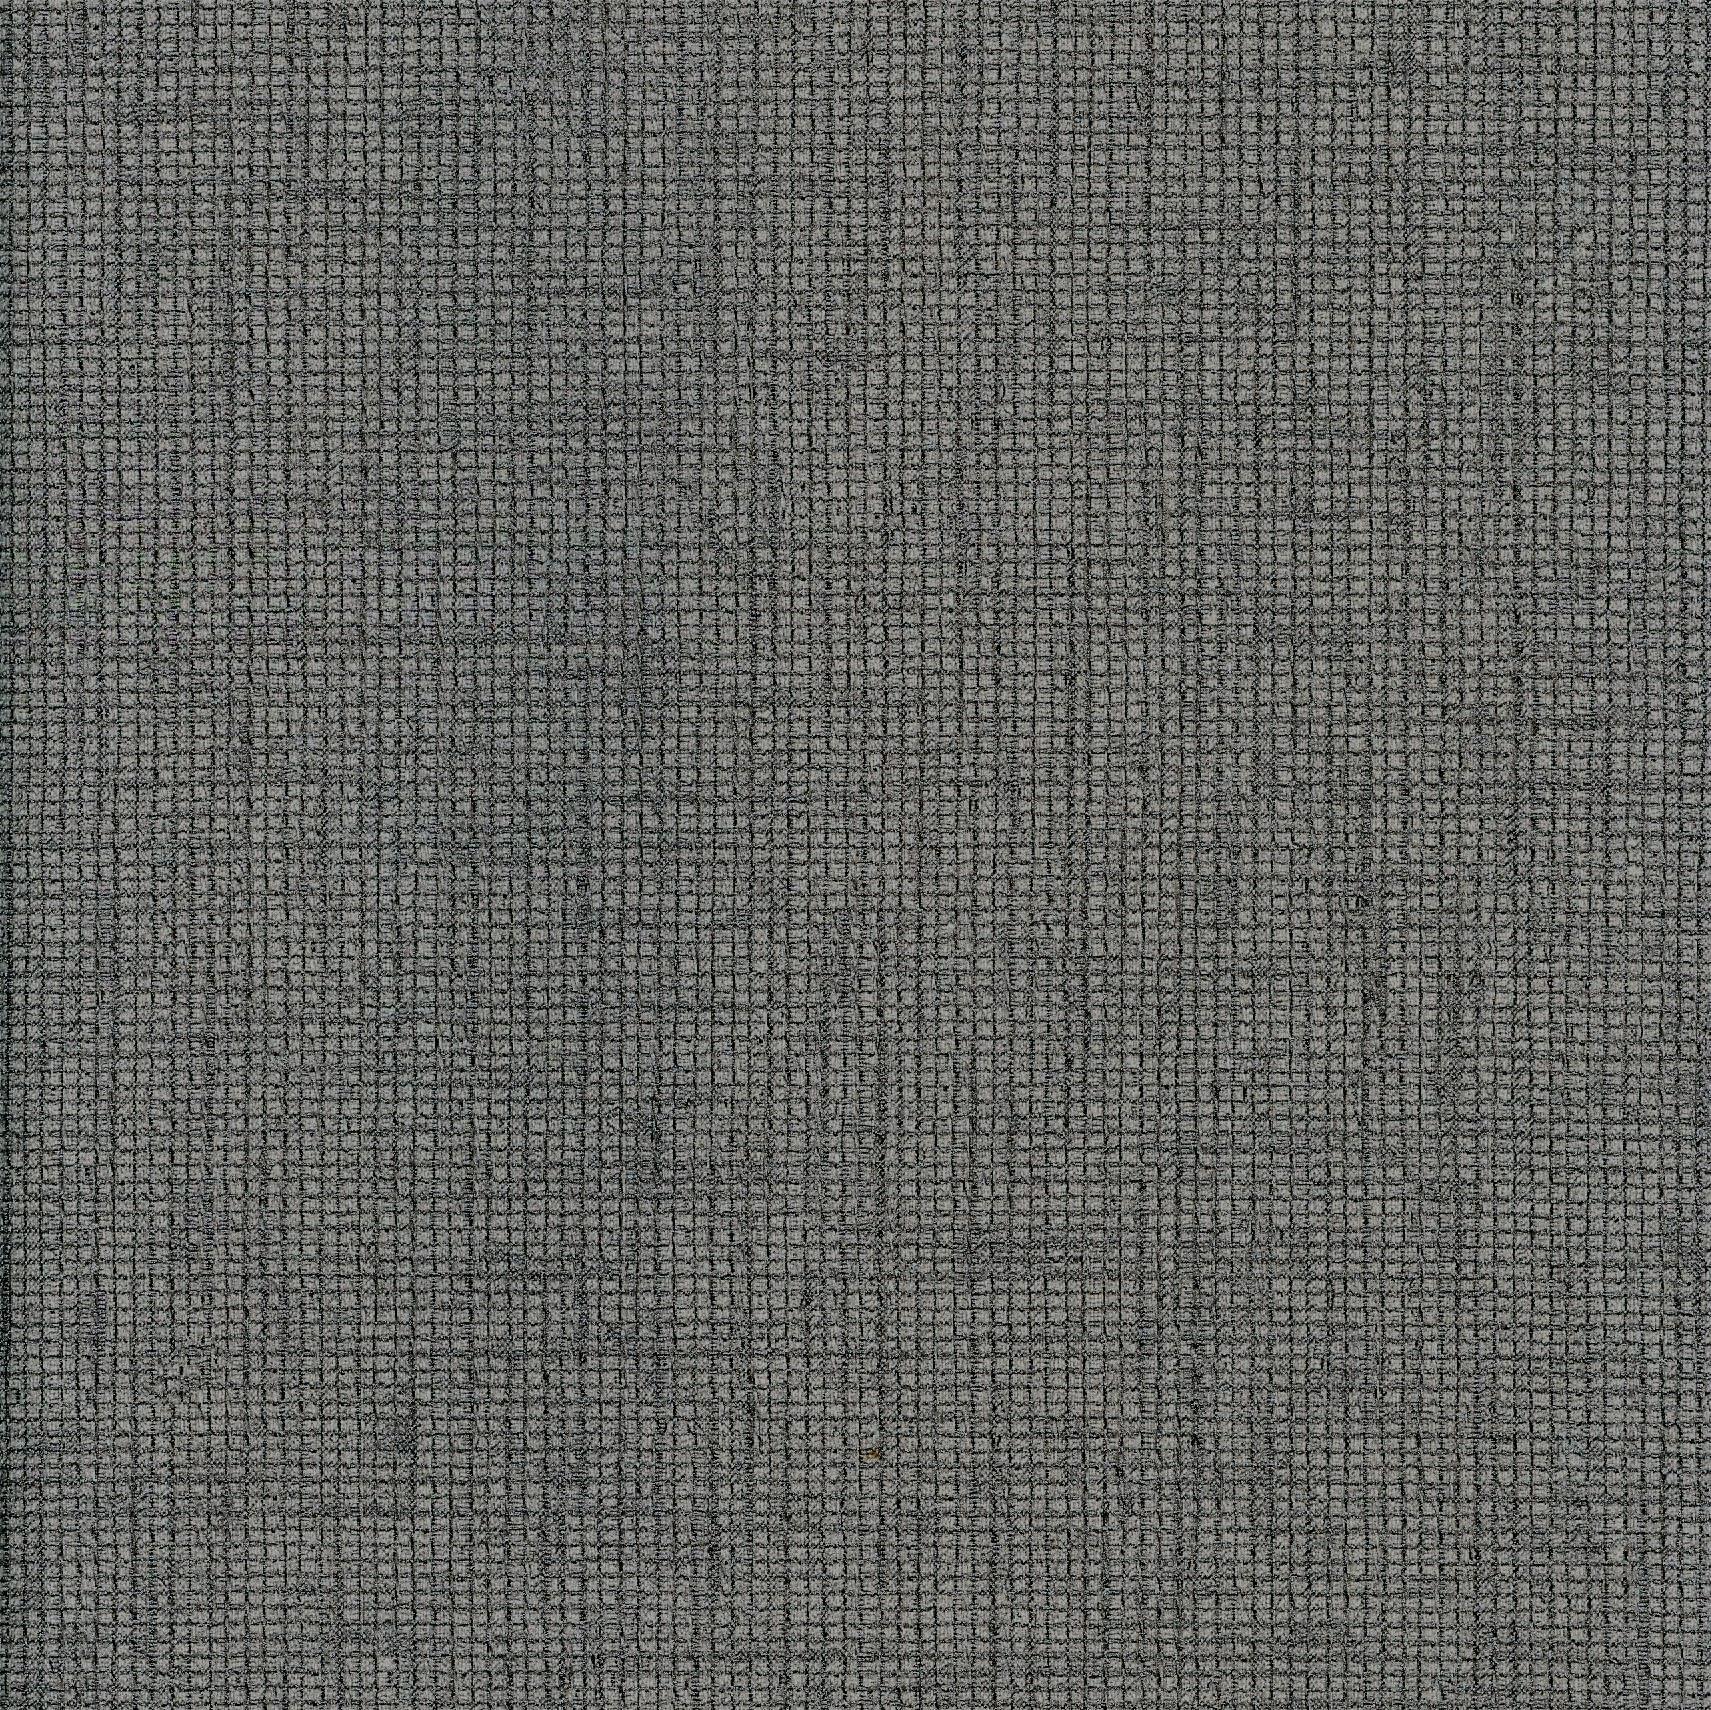 Papel de Parede Pure 2 Tramado 187513 - Rolo: 10m x 0,53m